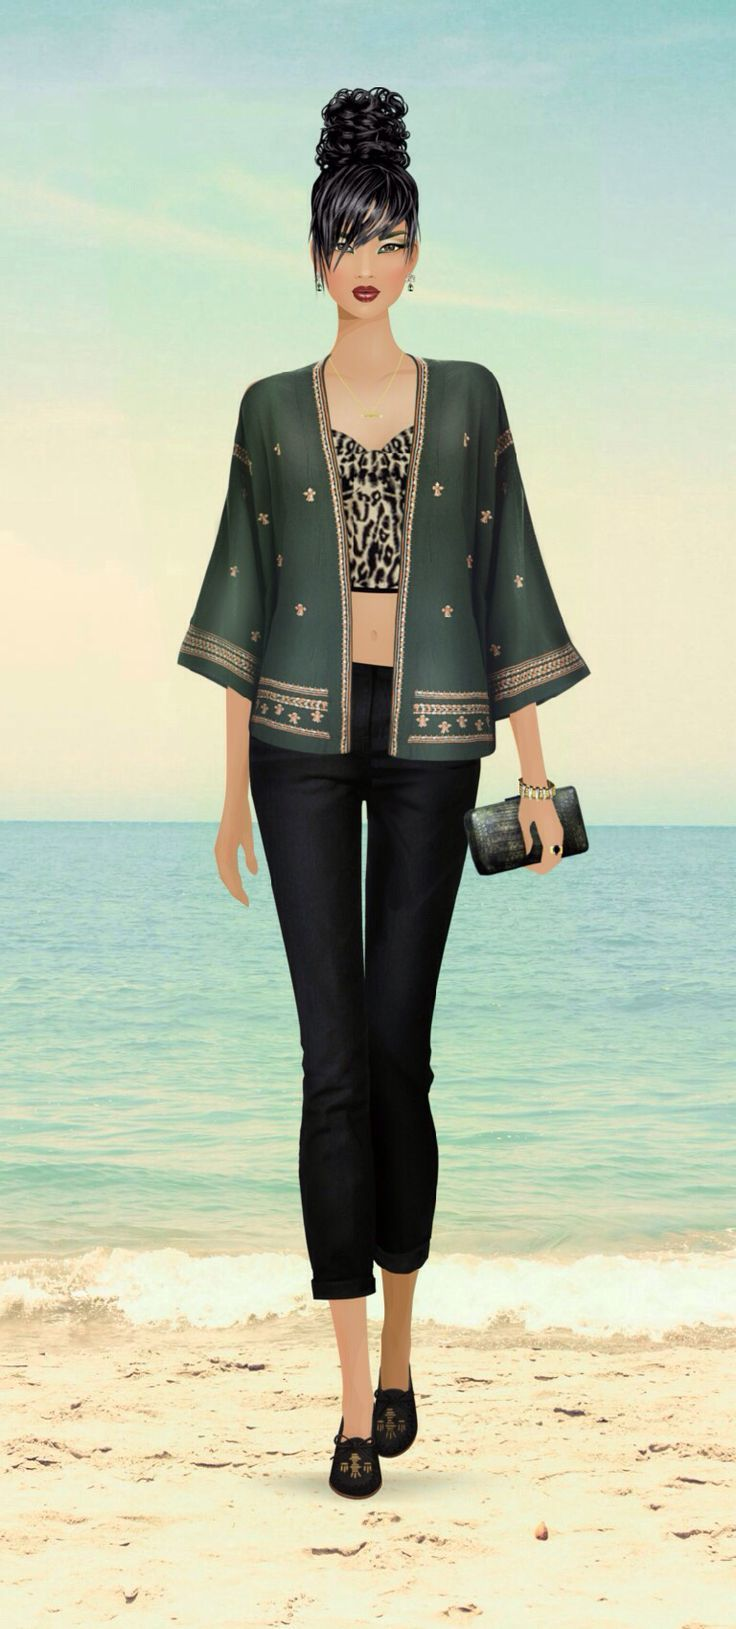 82fe604045170d30e00ce3cc5873add5 Jpg 736 1 629 Pixels Virtual Fashion Fashion Fashion Event